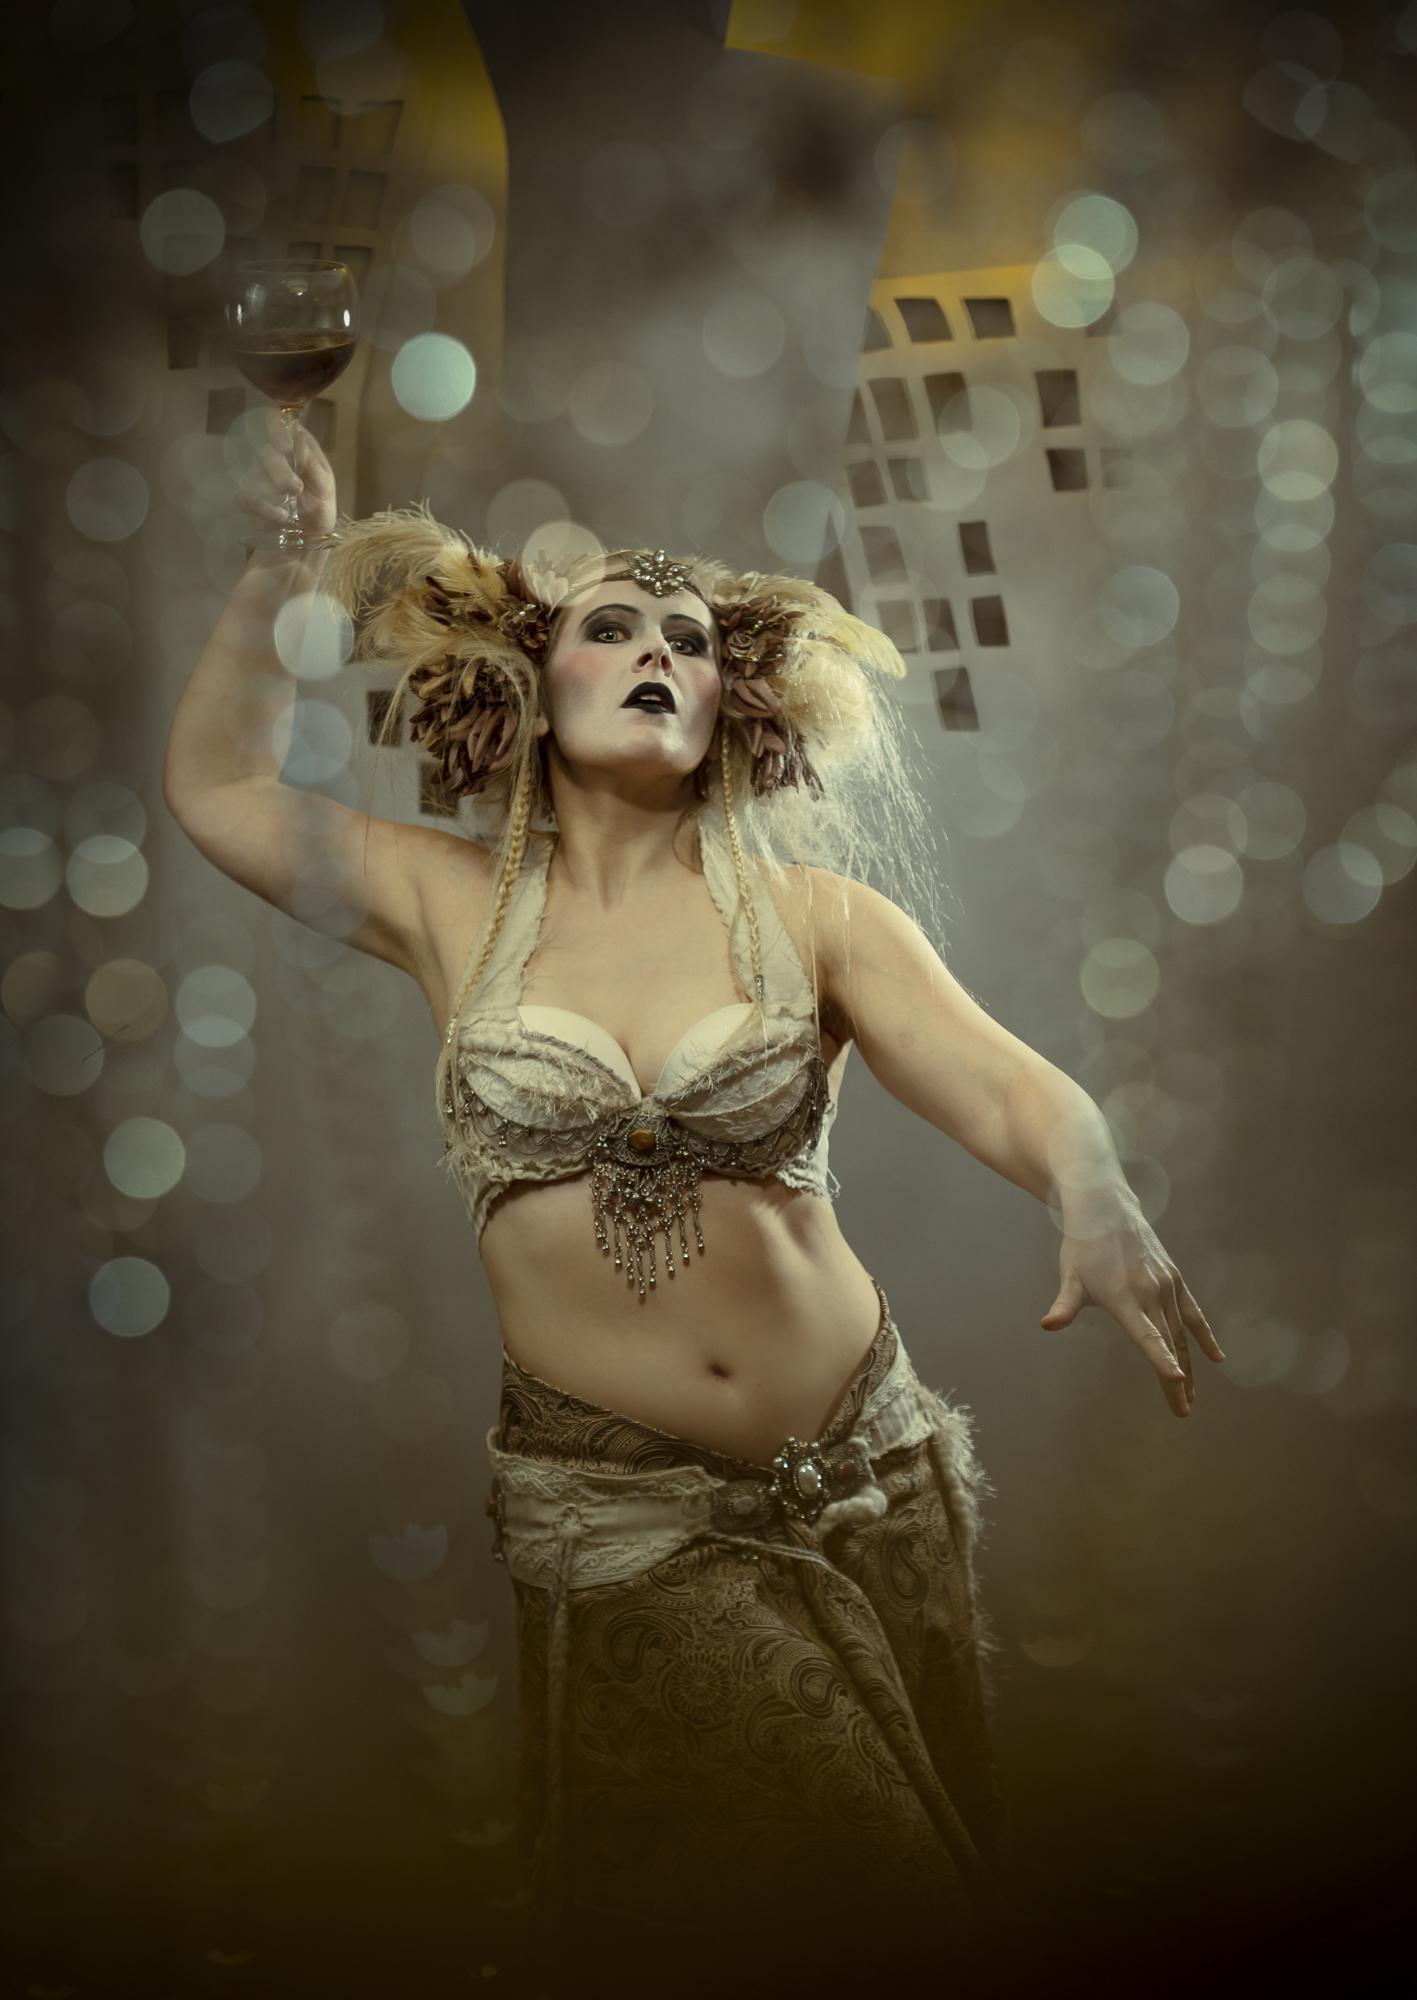 Kalendershooting | Metropolis | Scherenschnitt | Kostüm | Make-Up | Selbstportrait